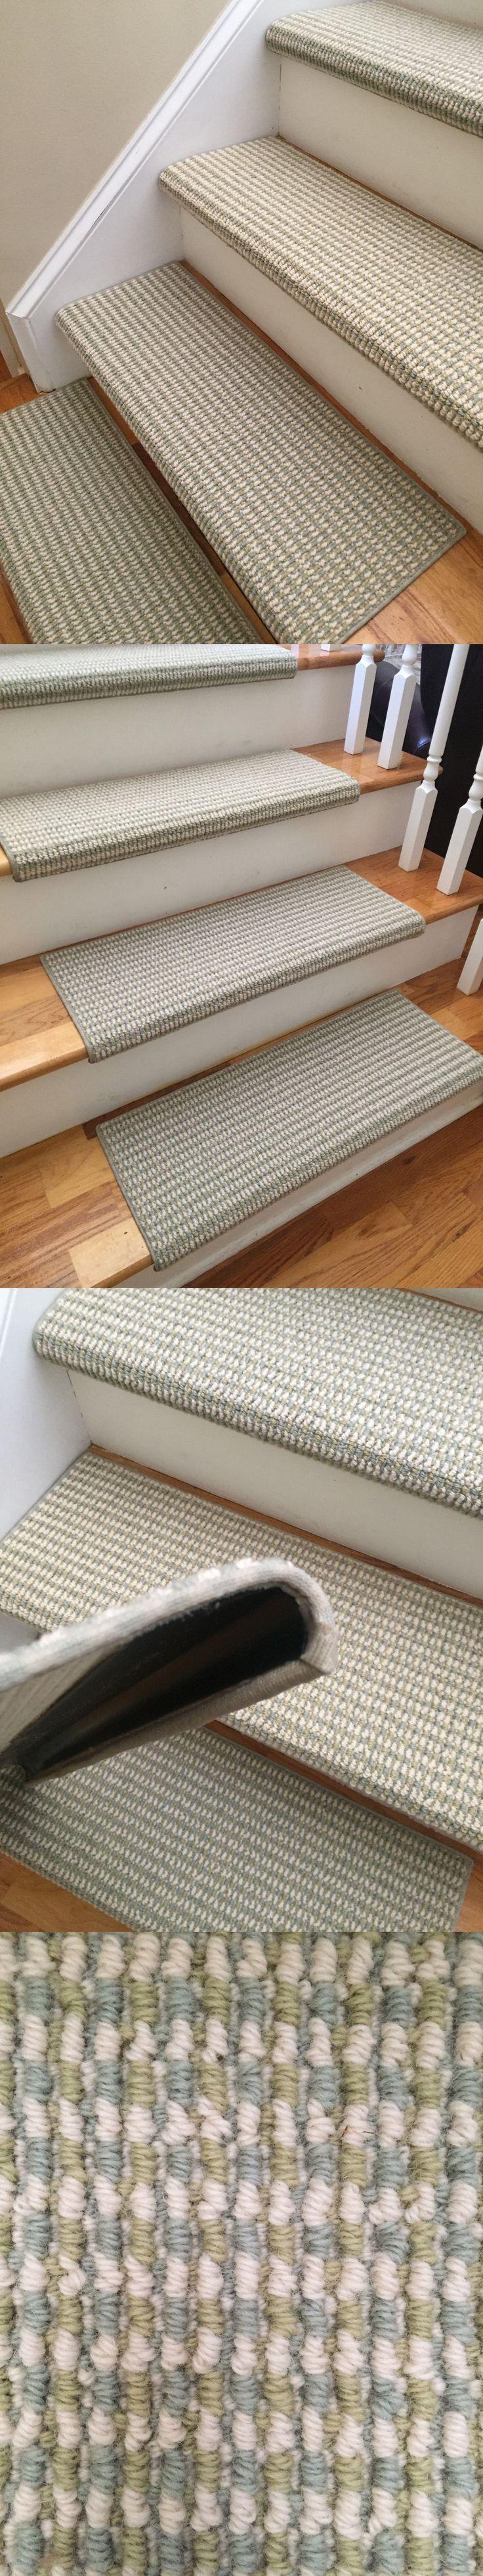 Stair Treads 175517: Sunburst Melody 100% New Zealand Wool True Bullnose™ Carpet Stair Tread Jmish -> BUY IT NOW ONLY: $150 on eBay!